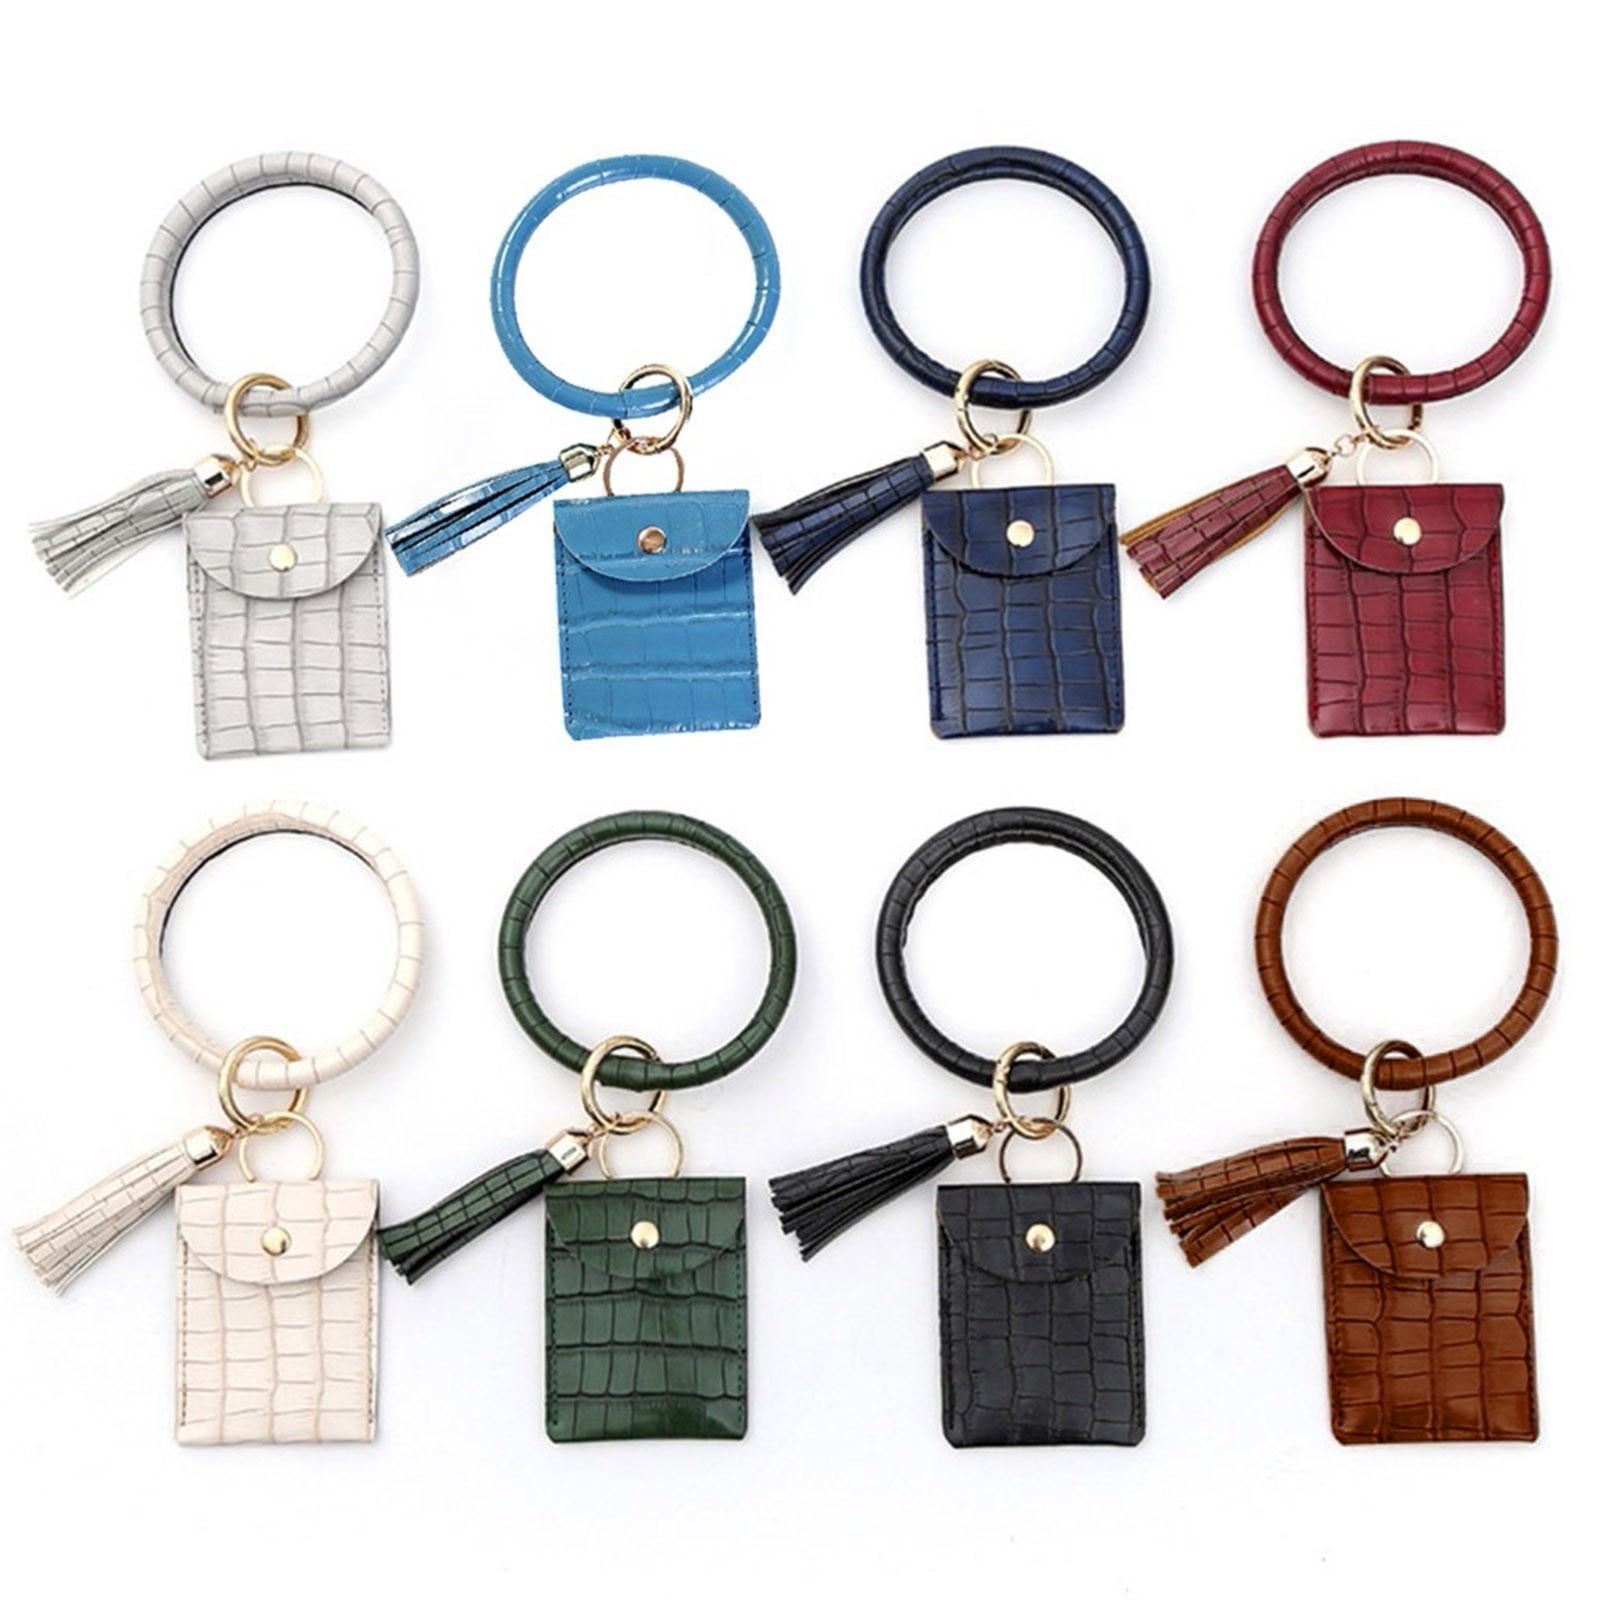 2021 große Armband Keychain Karte Halter Quaste Armreif Schlüssel Ring Wristban Mit Brieftasche Karte Feste Farbe Id Halter Bolsa